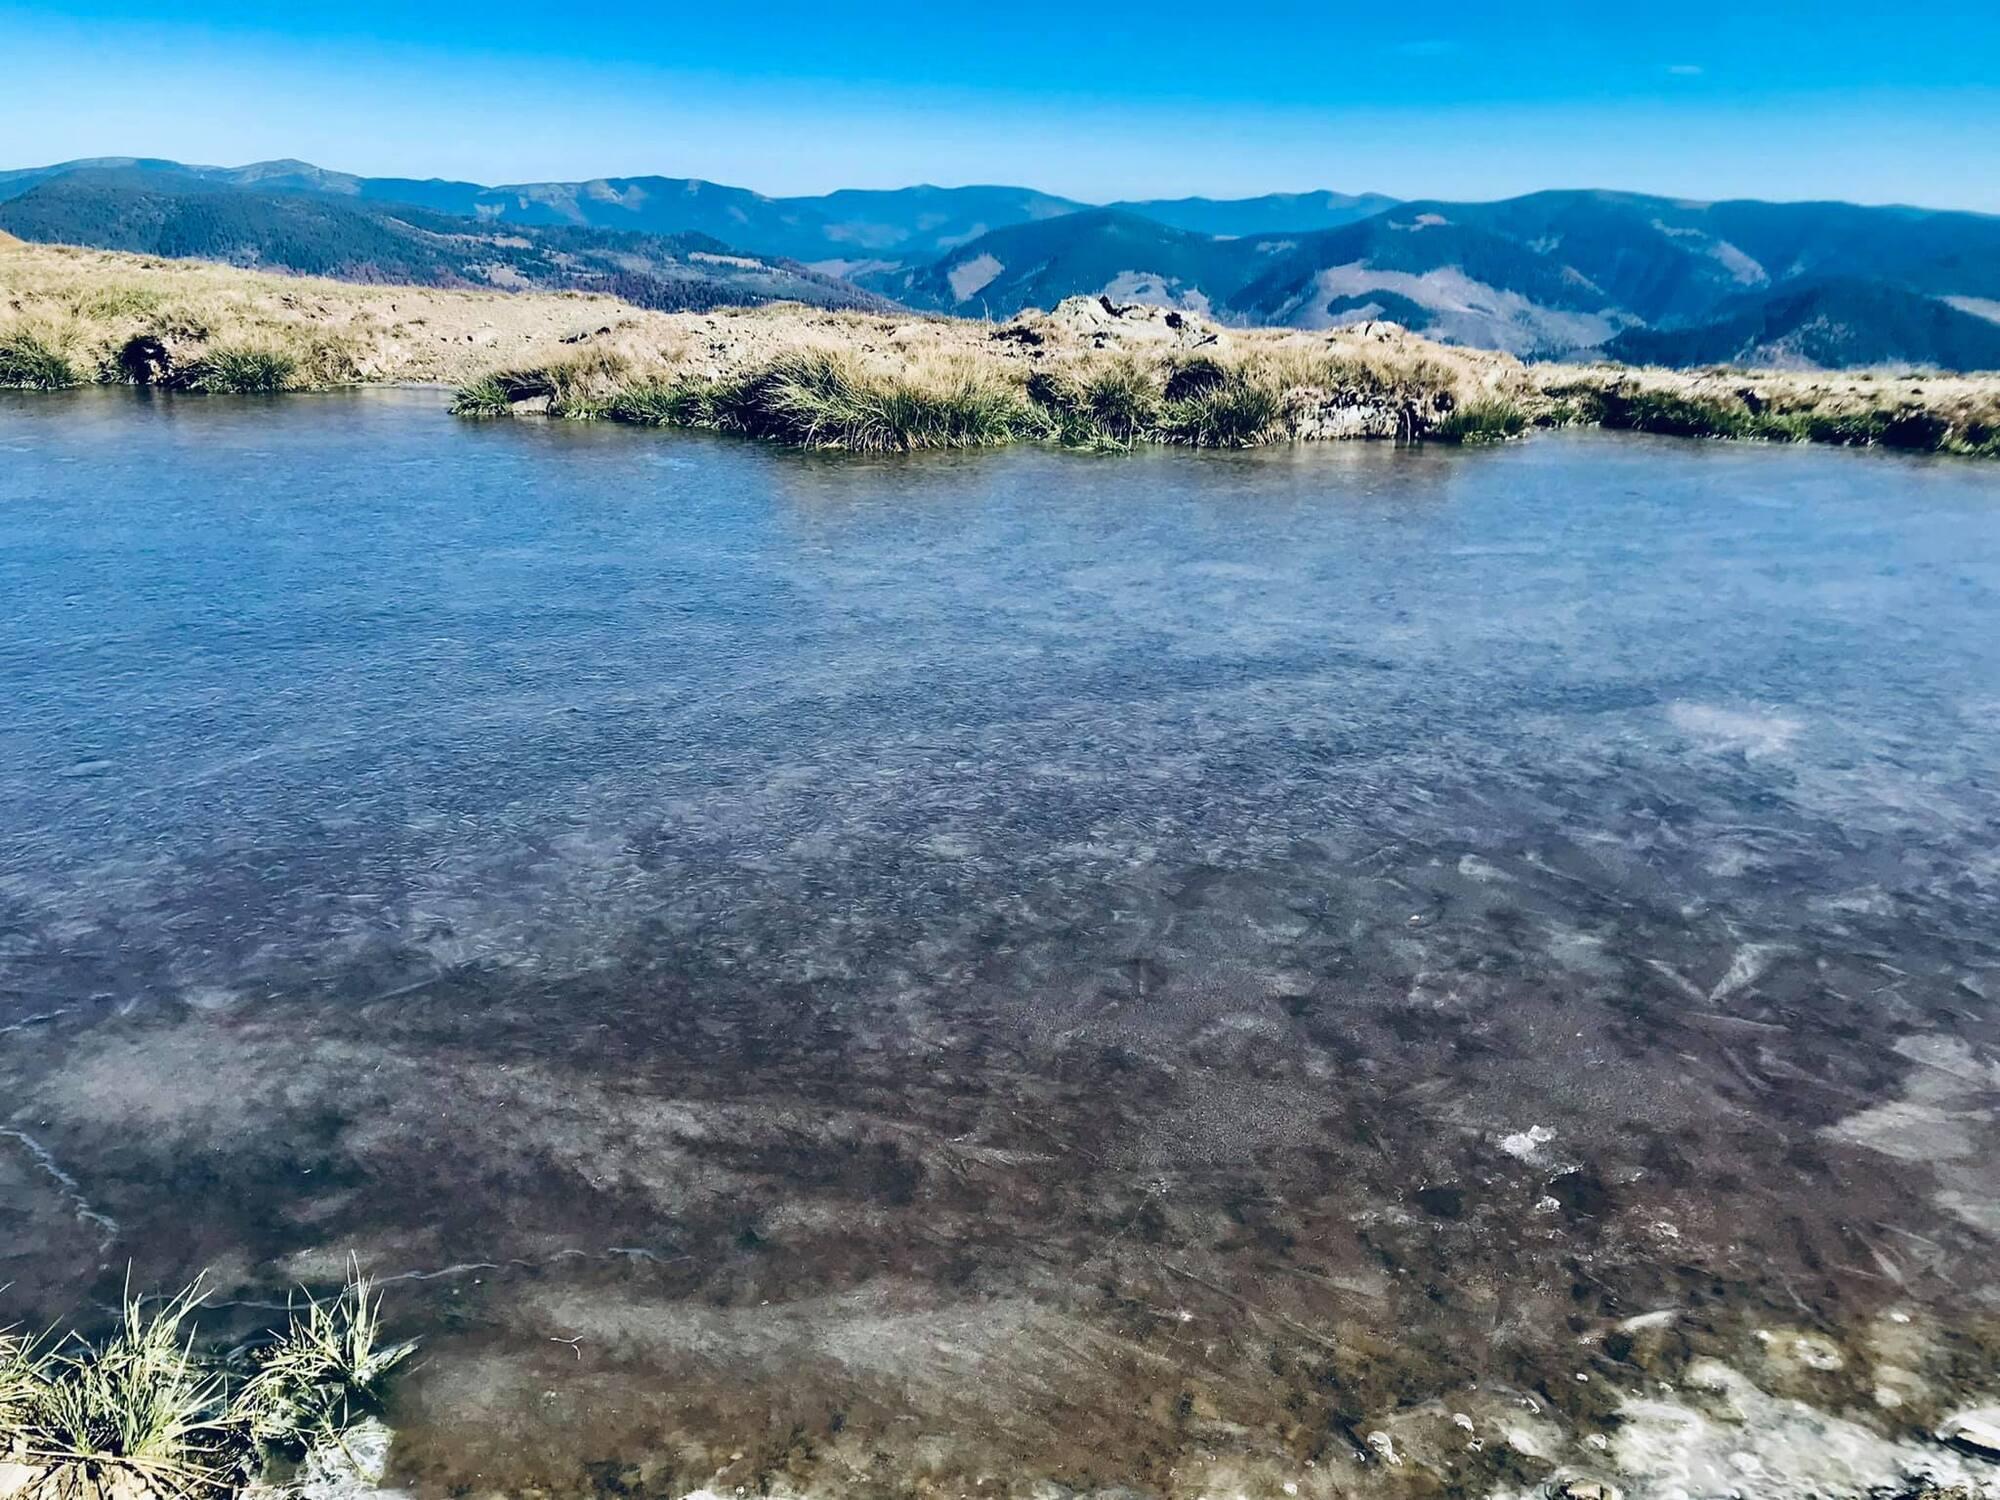 Замерзшее озеро в Карпатах